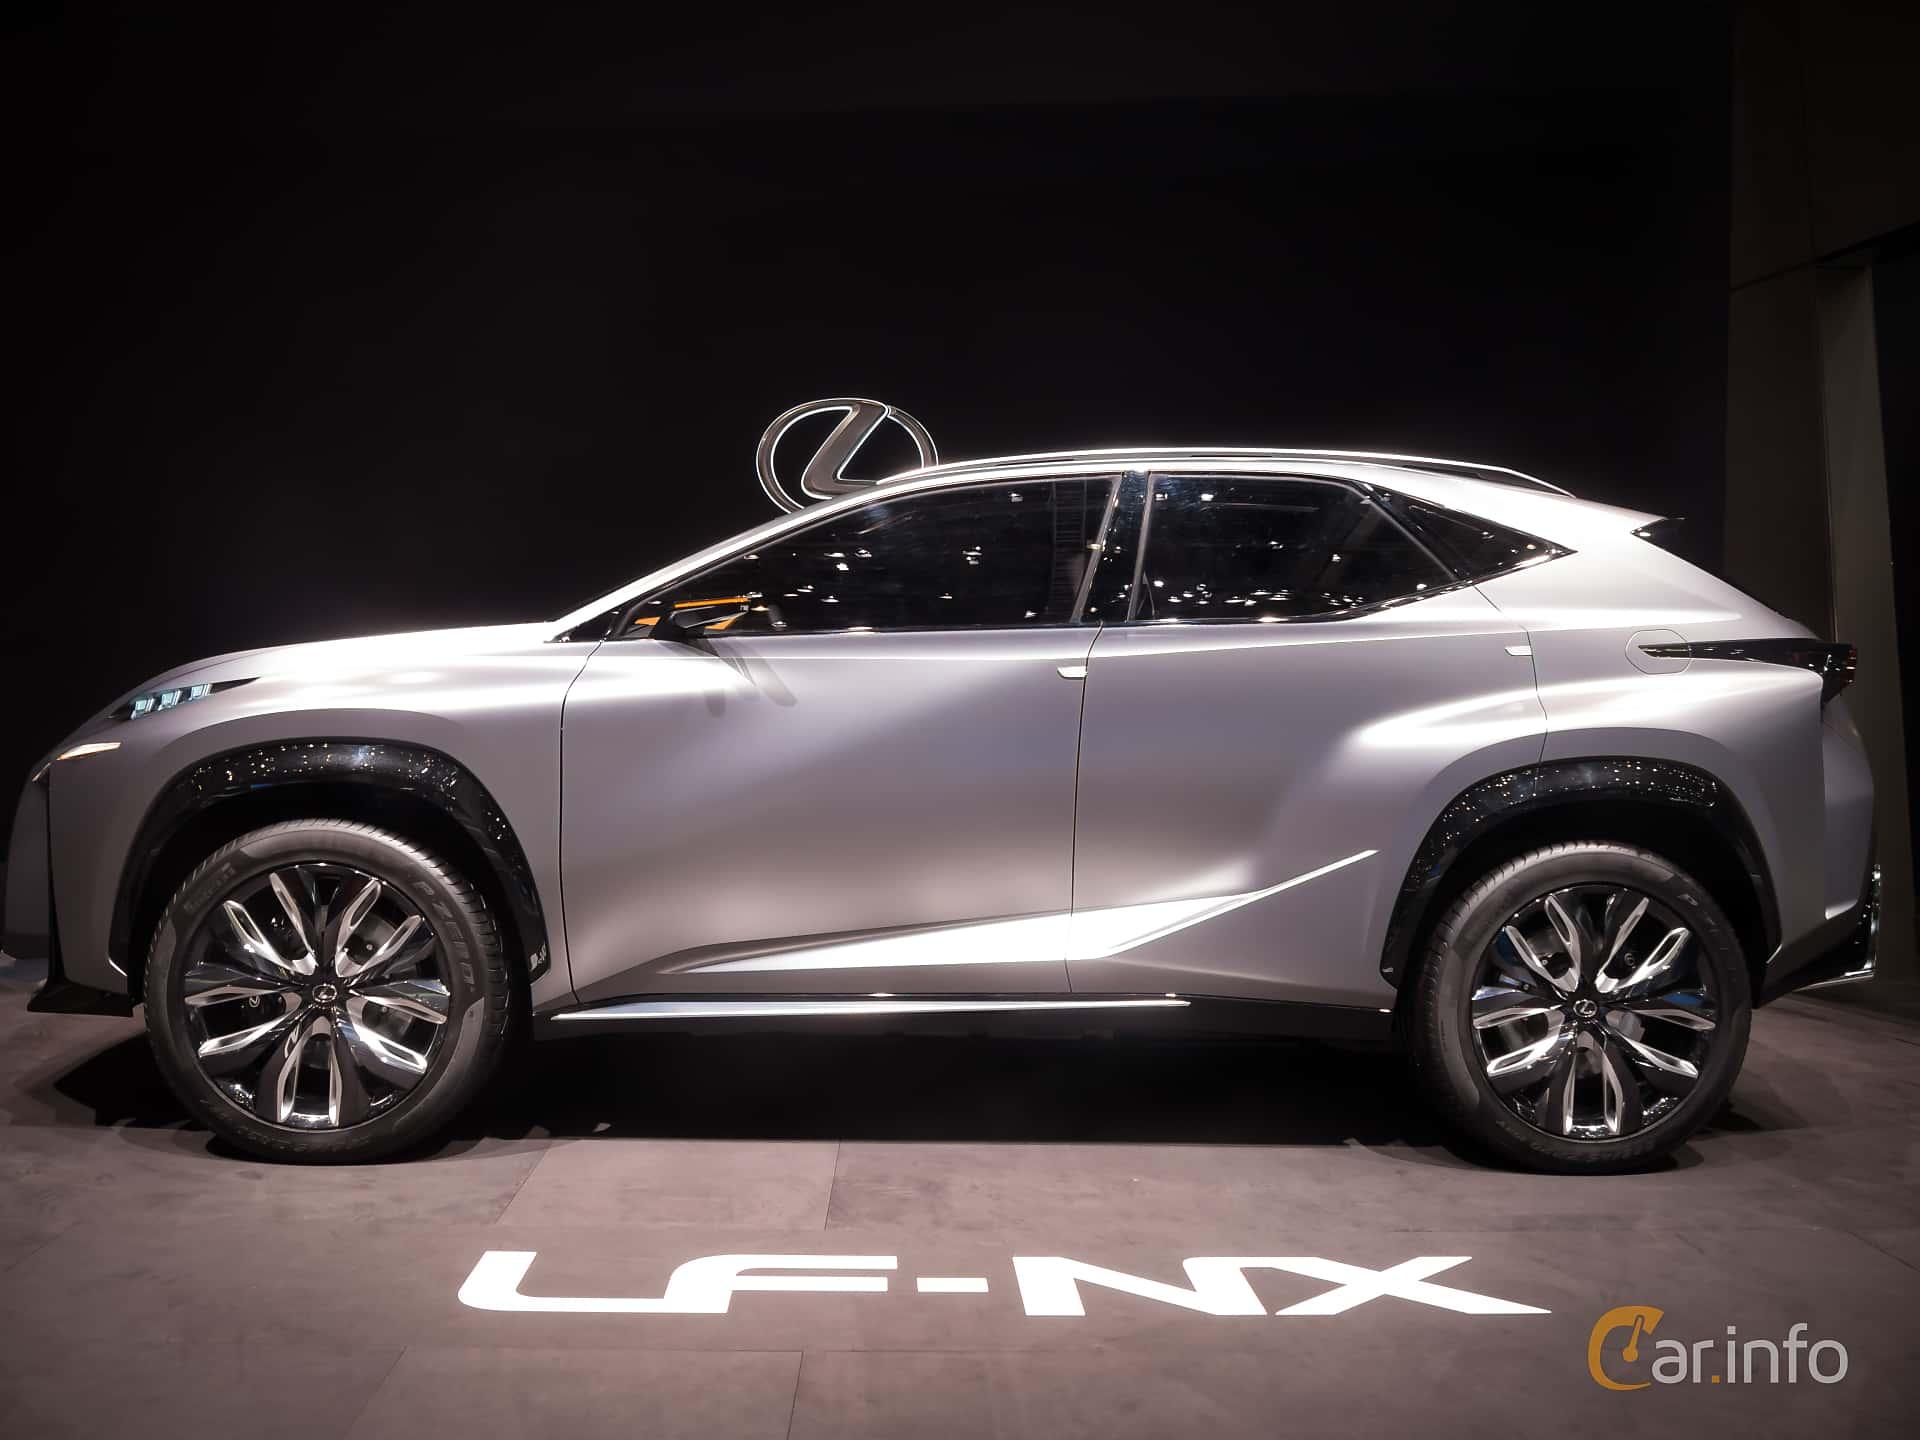 https://s.car.info/image_files/1920/lexus-lf-nx-side-geneva-motor-show-2014-1-44141.jpg